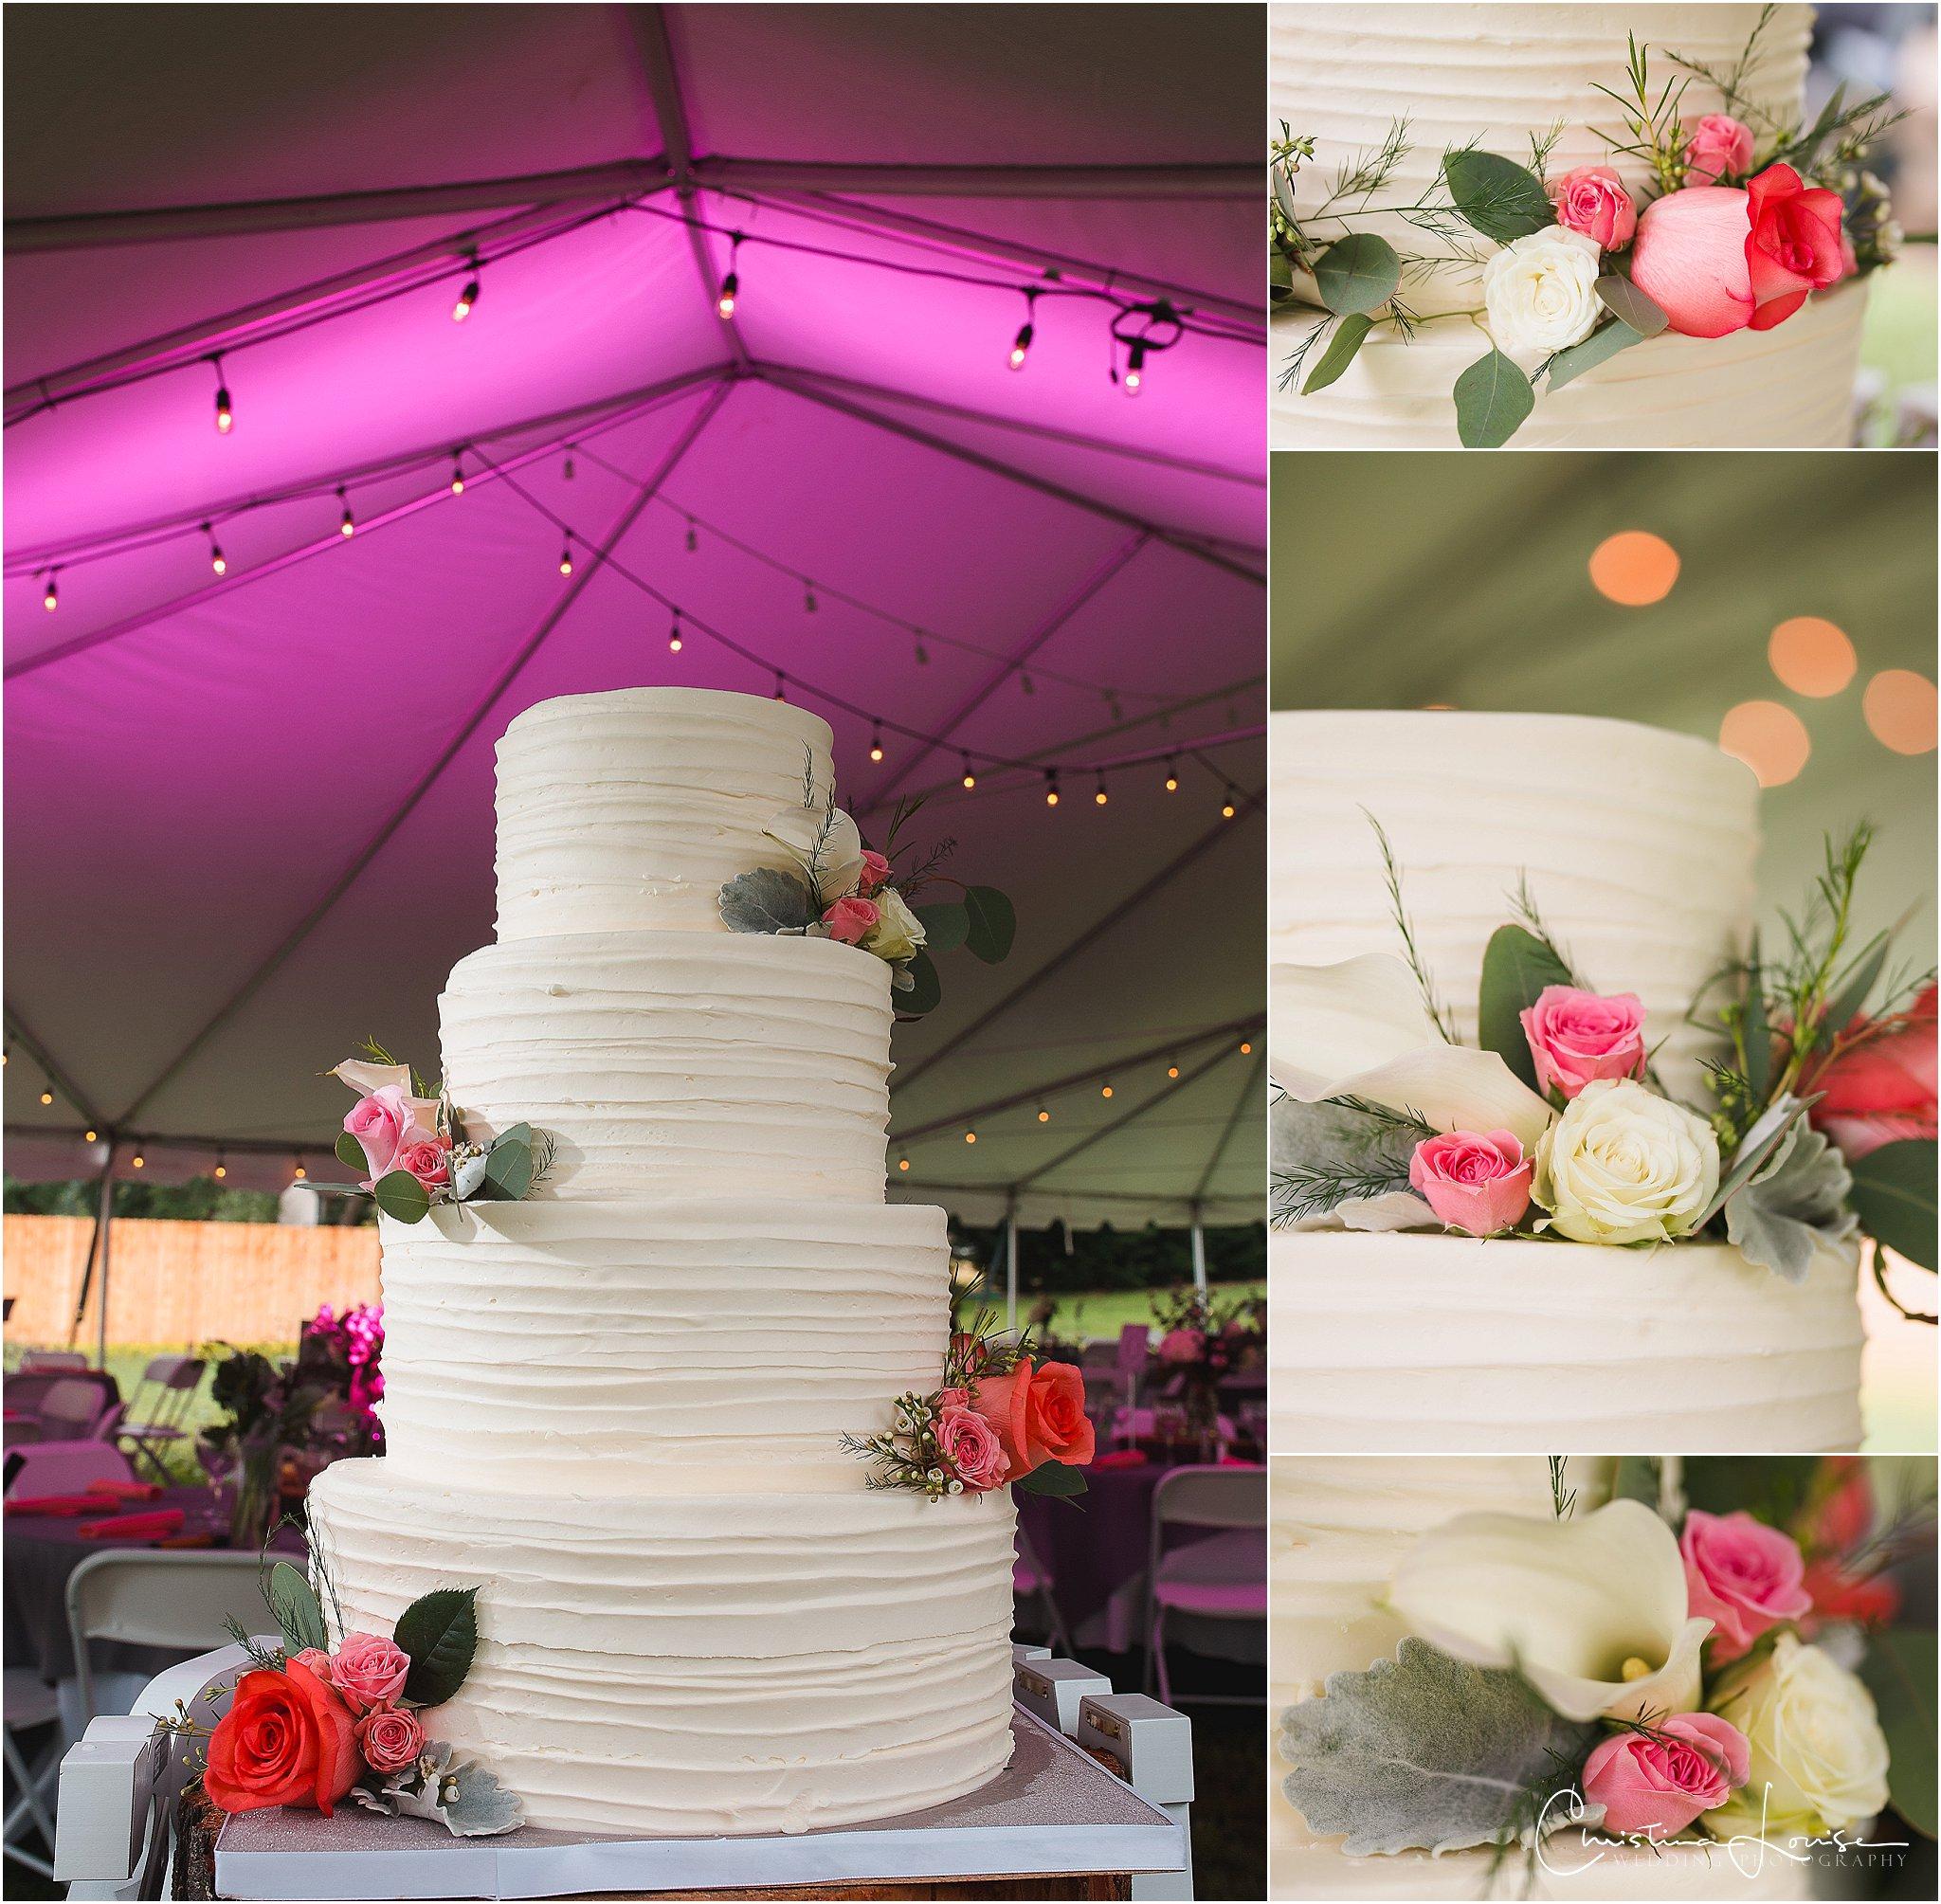 simply_delicious_cakes_roseburg_oregon.jpg